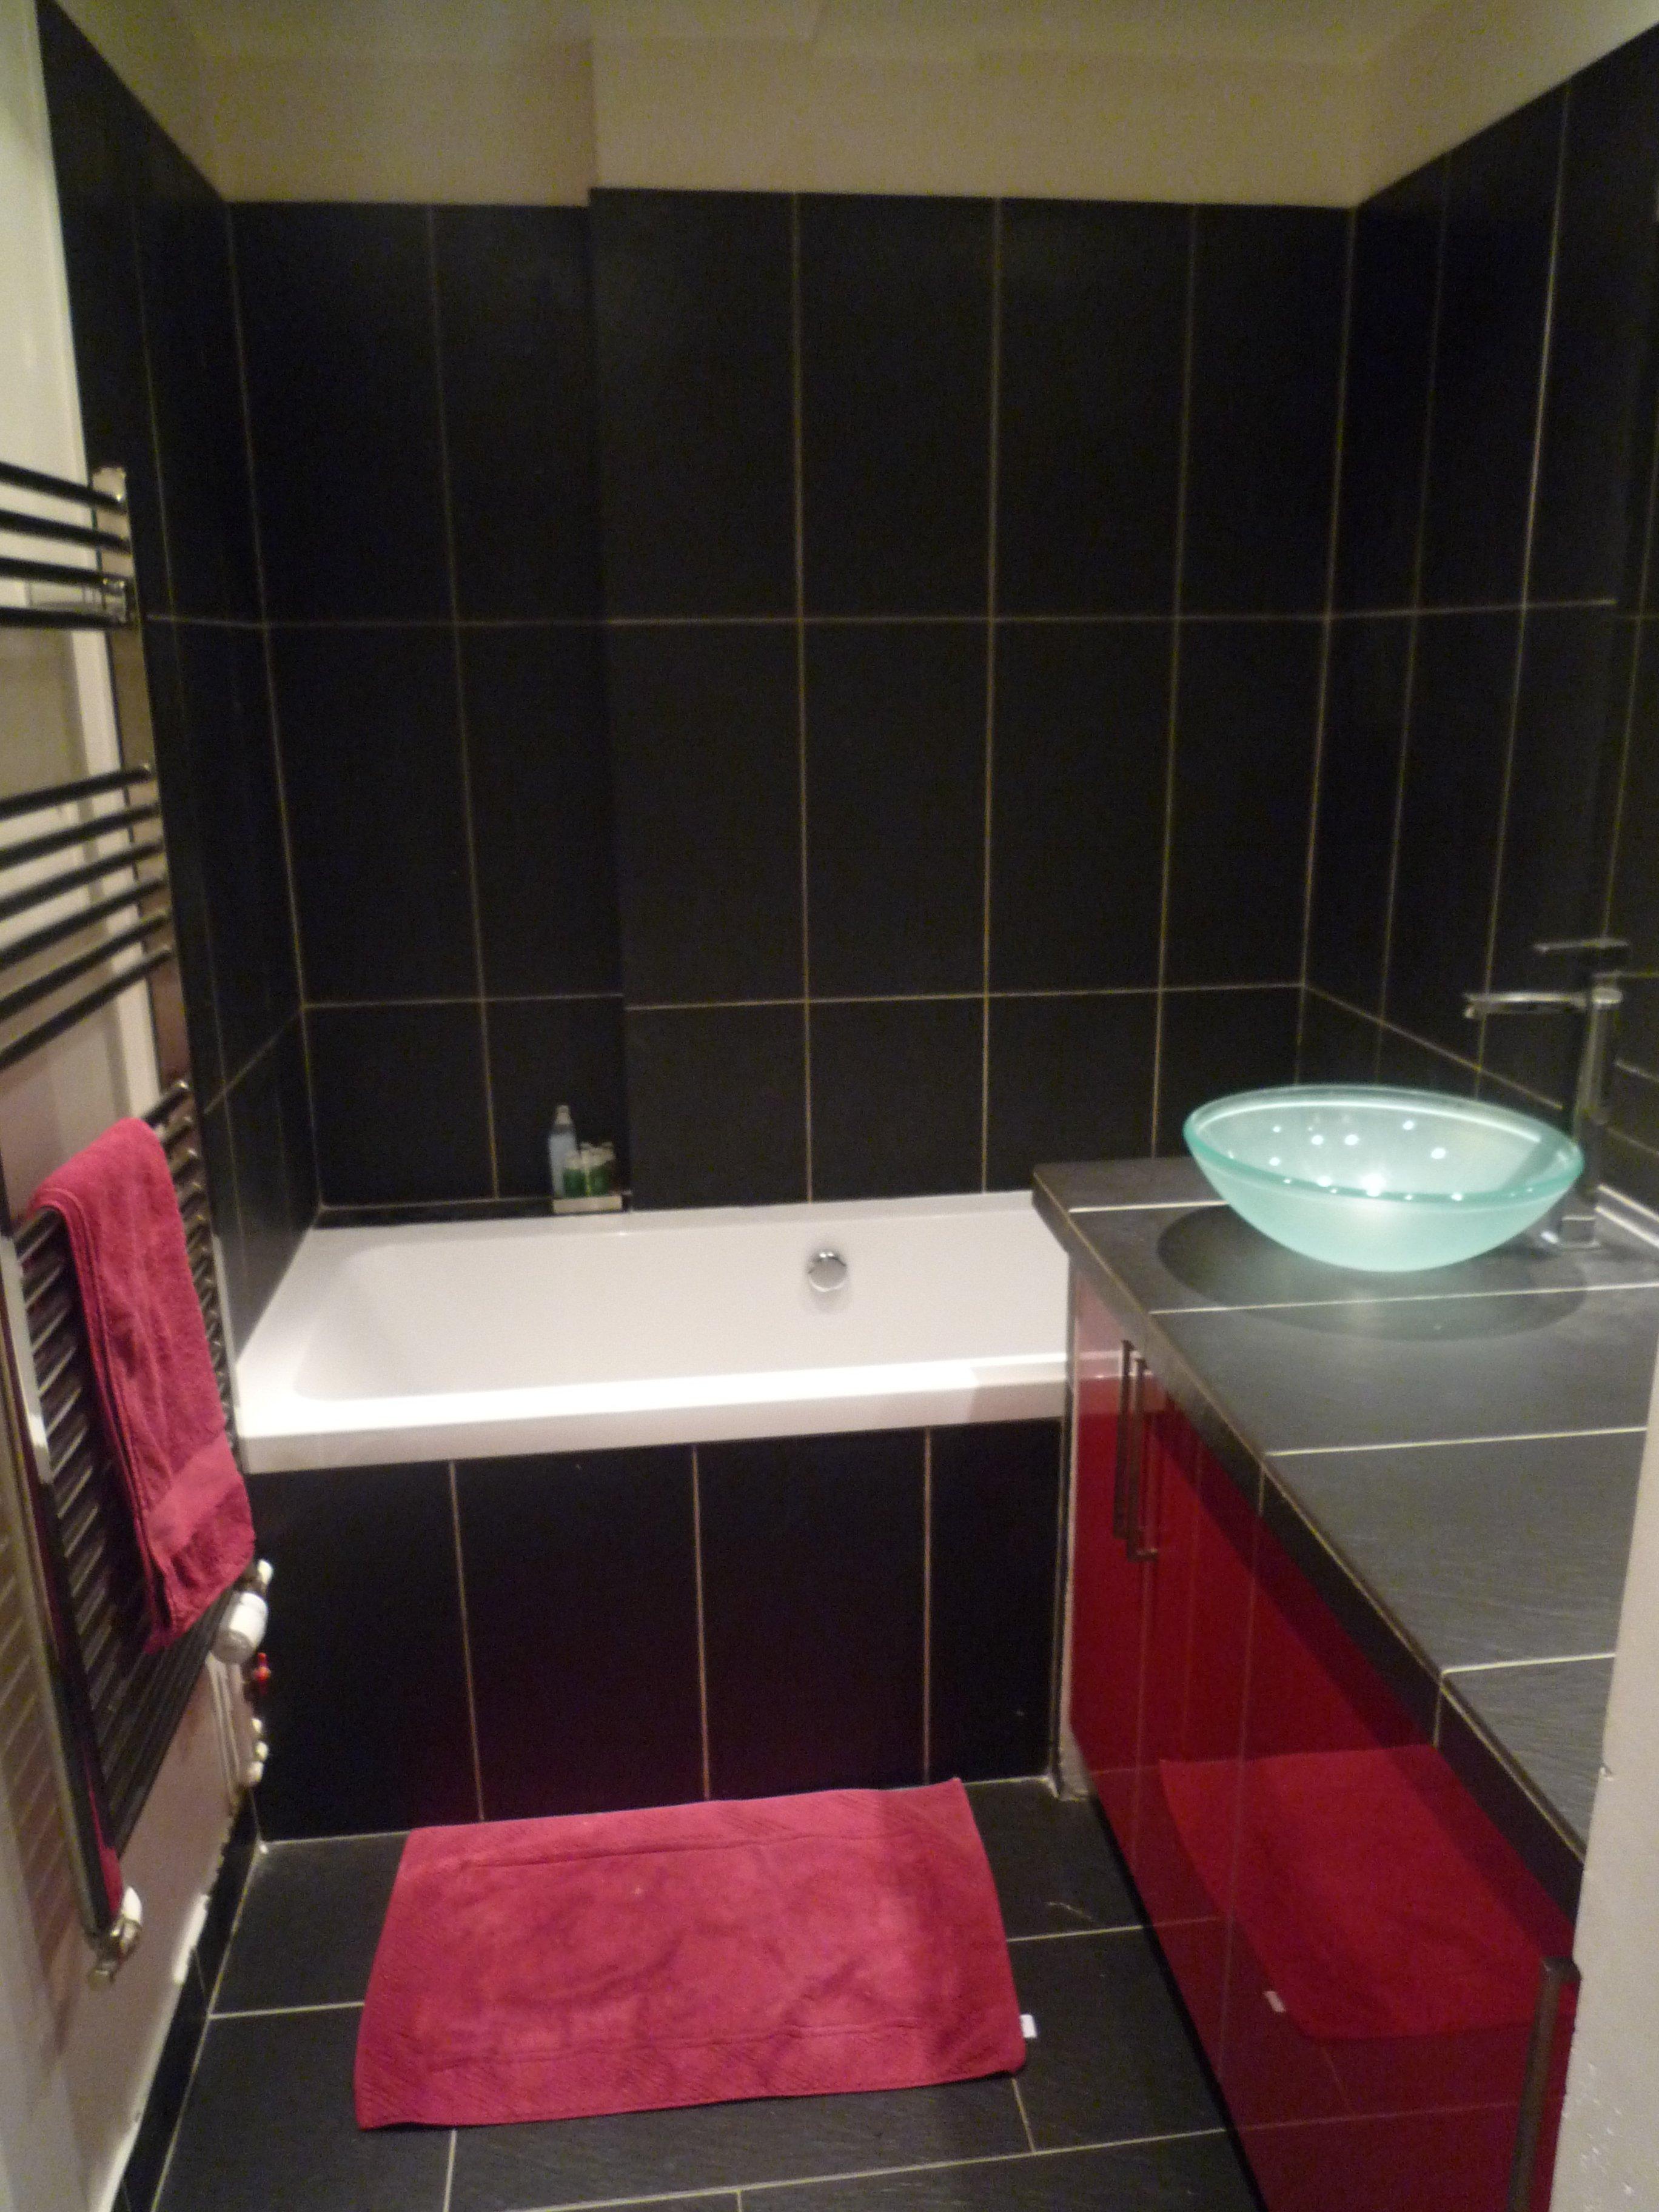 une salle de bain est equipee dune vasque - Une Salle De Bain Est Equipee Dune Vasque